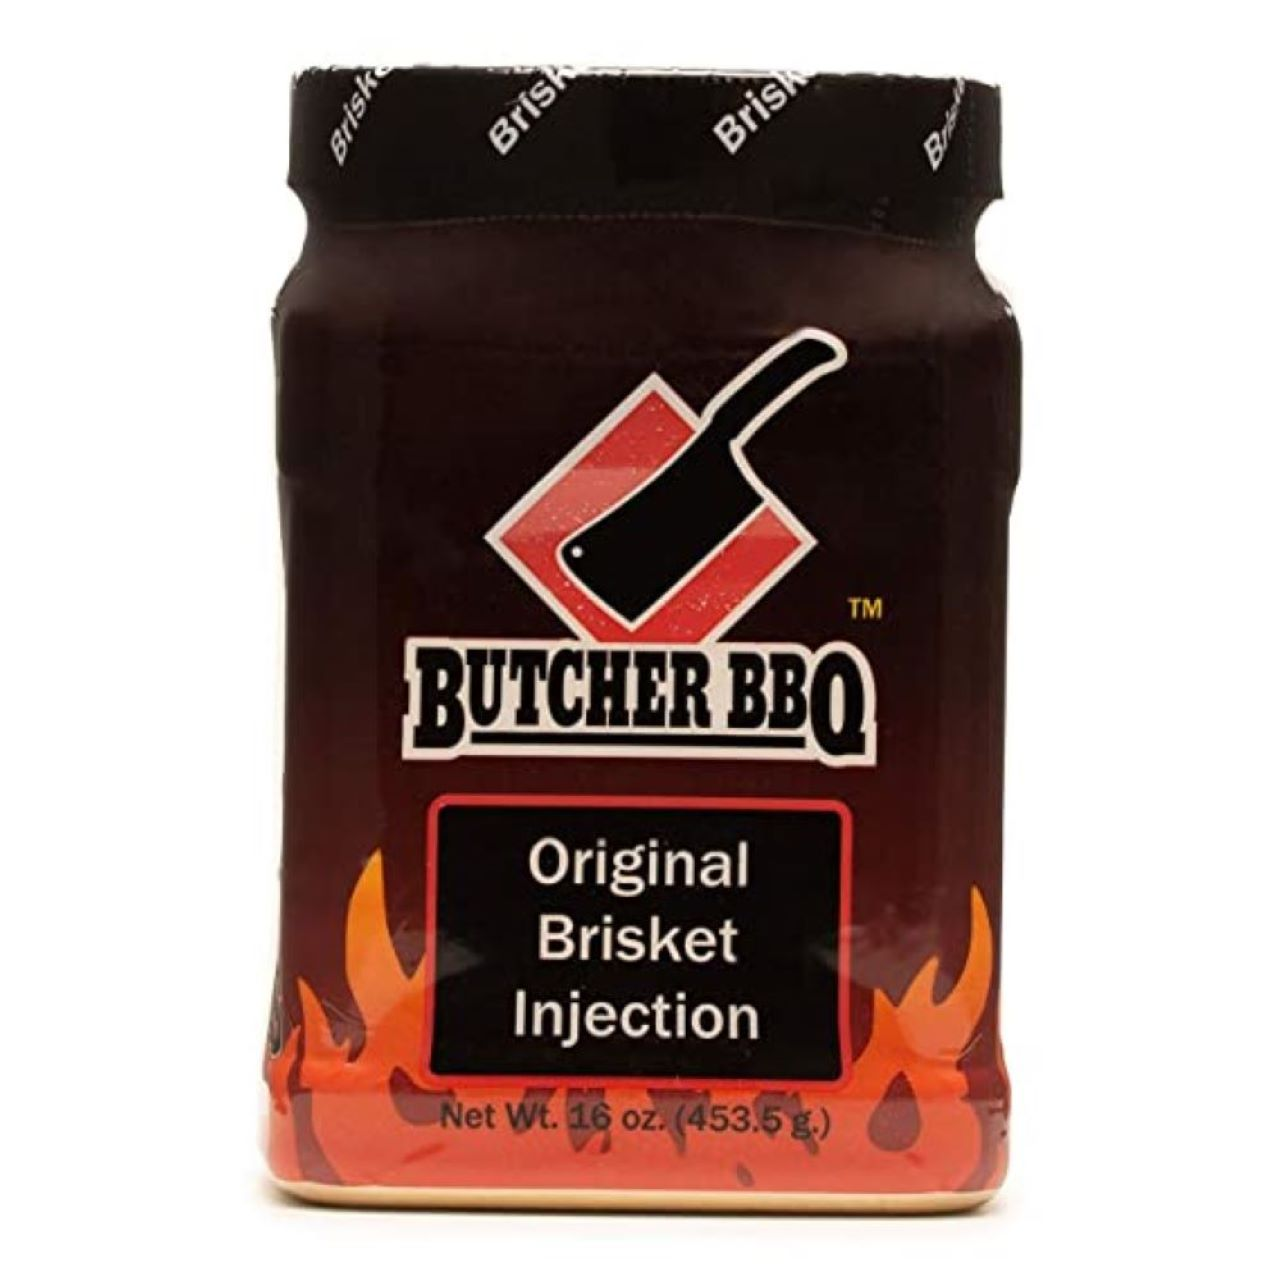 Butcher BBQ 16oz Original Brisket Powder Injection Marinade